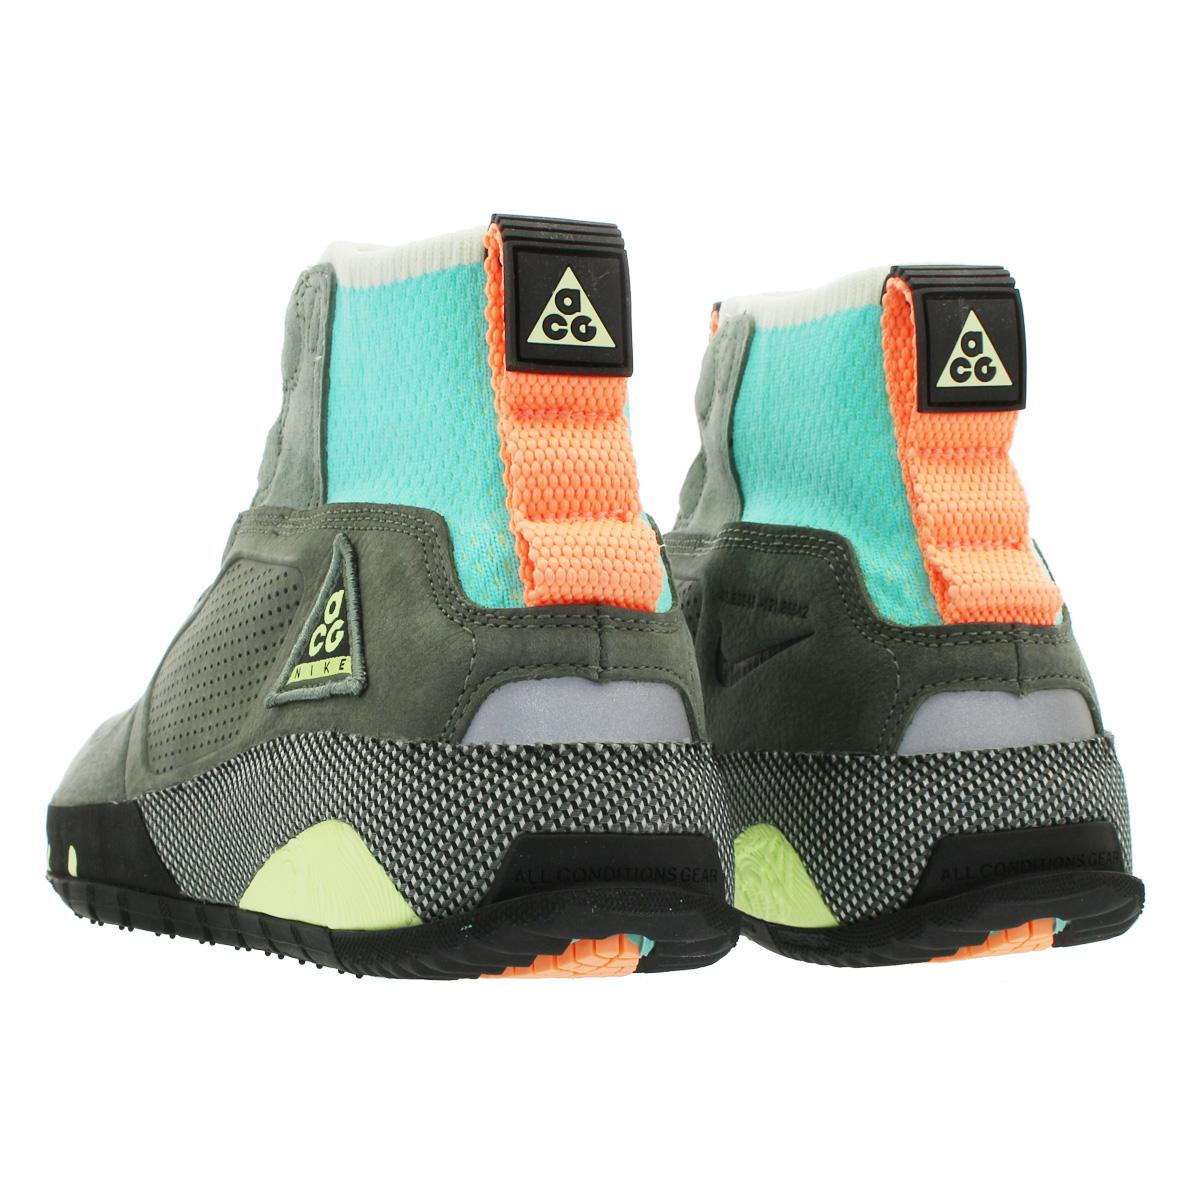 2da955d84b63 NIKE ACG RUCKEL RIDGE Nike ACG ラックルリッジ MULTI COLOR CLAY GREEN BLACK BARELY  VOLT aq9333-900